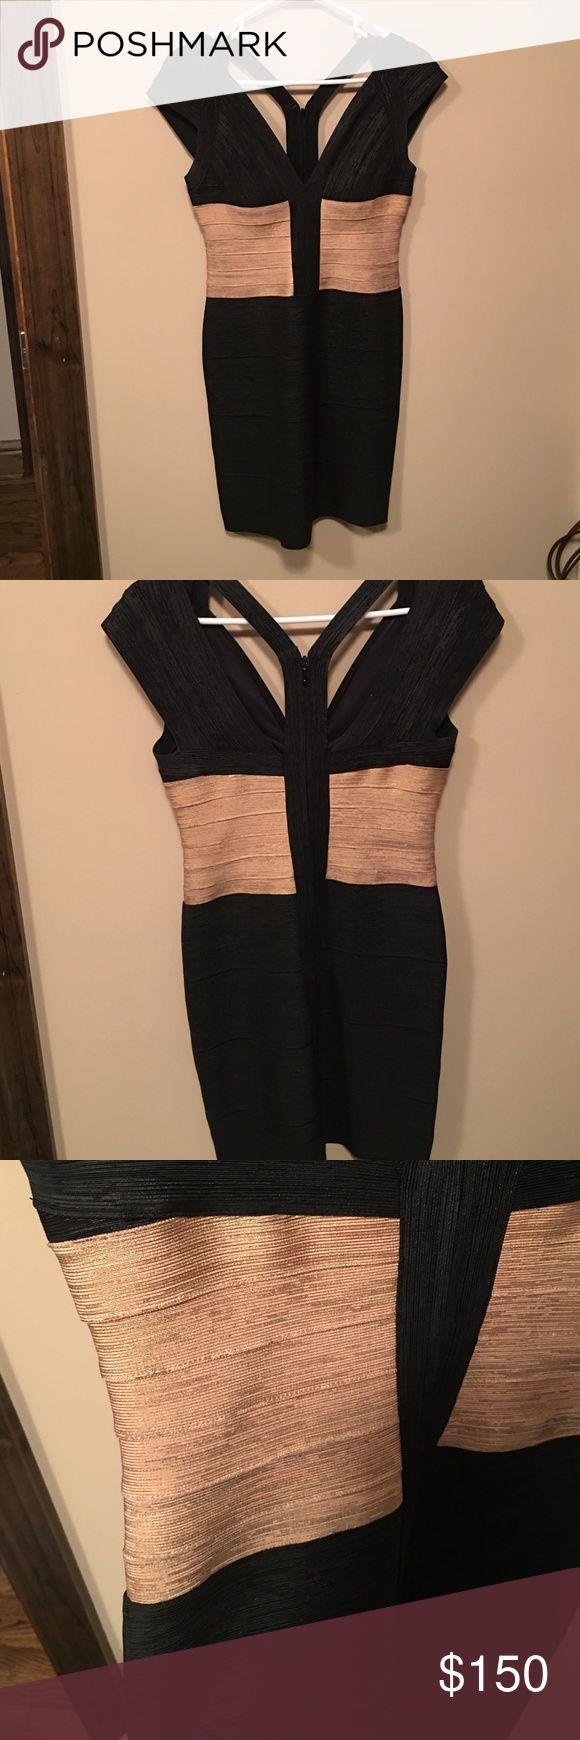 MacDuggal Black and Gold Bandage Dress Worn once. Macduggal Dresses Mini